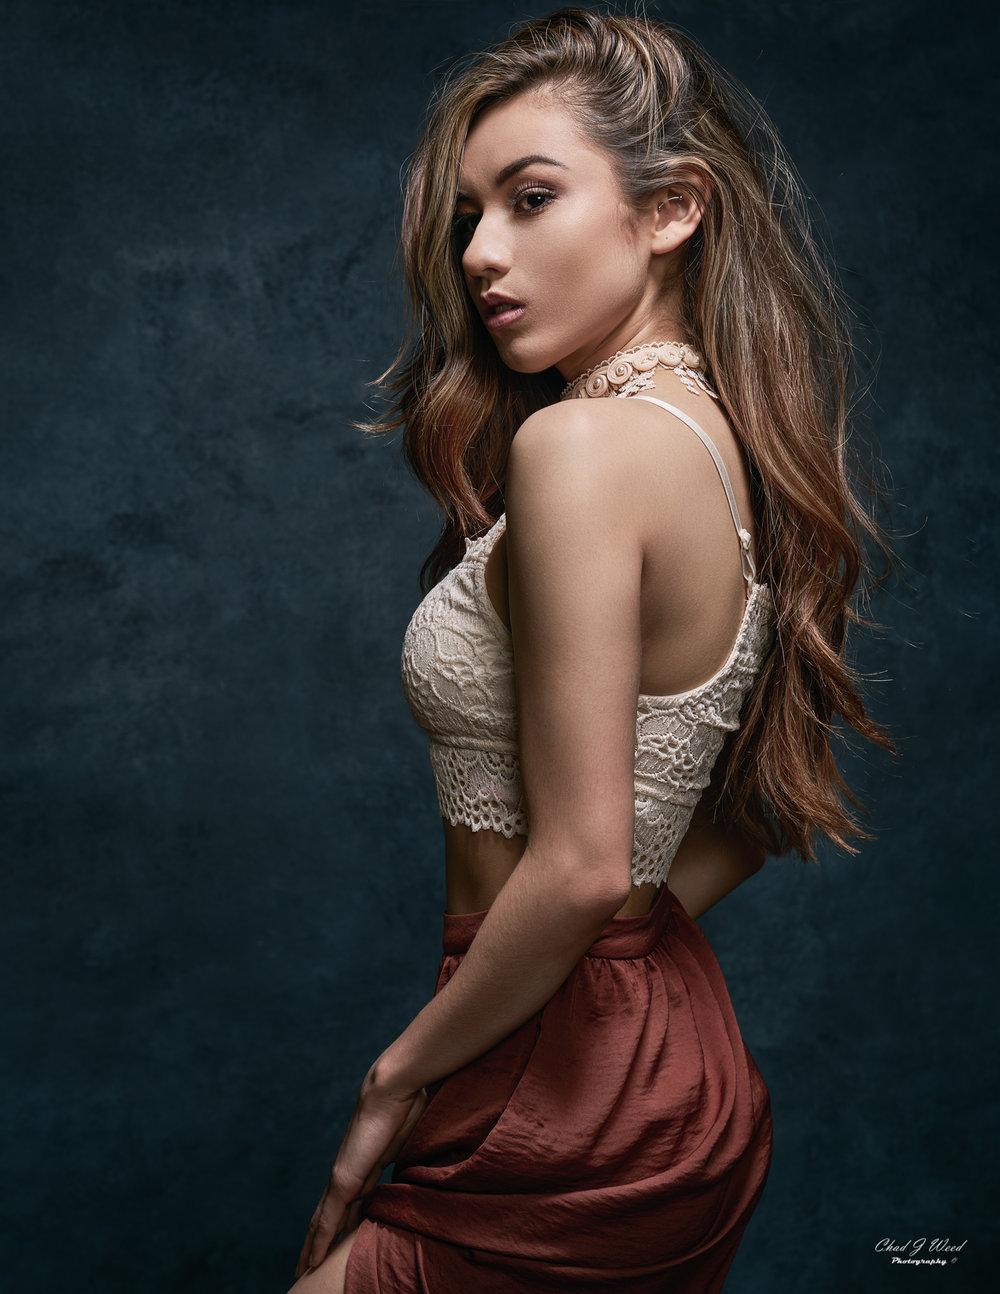 Arizona Beauty  Model Candice by Arizona Beauty Portrait Photographer Chad Weed